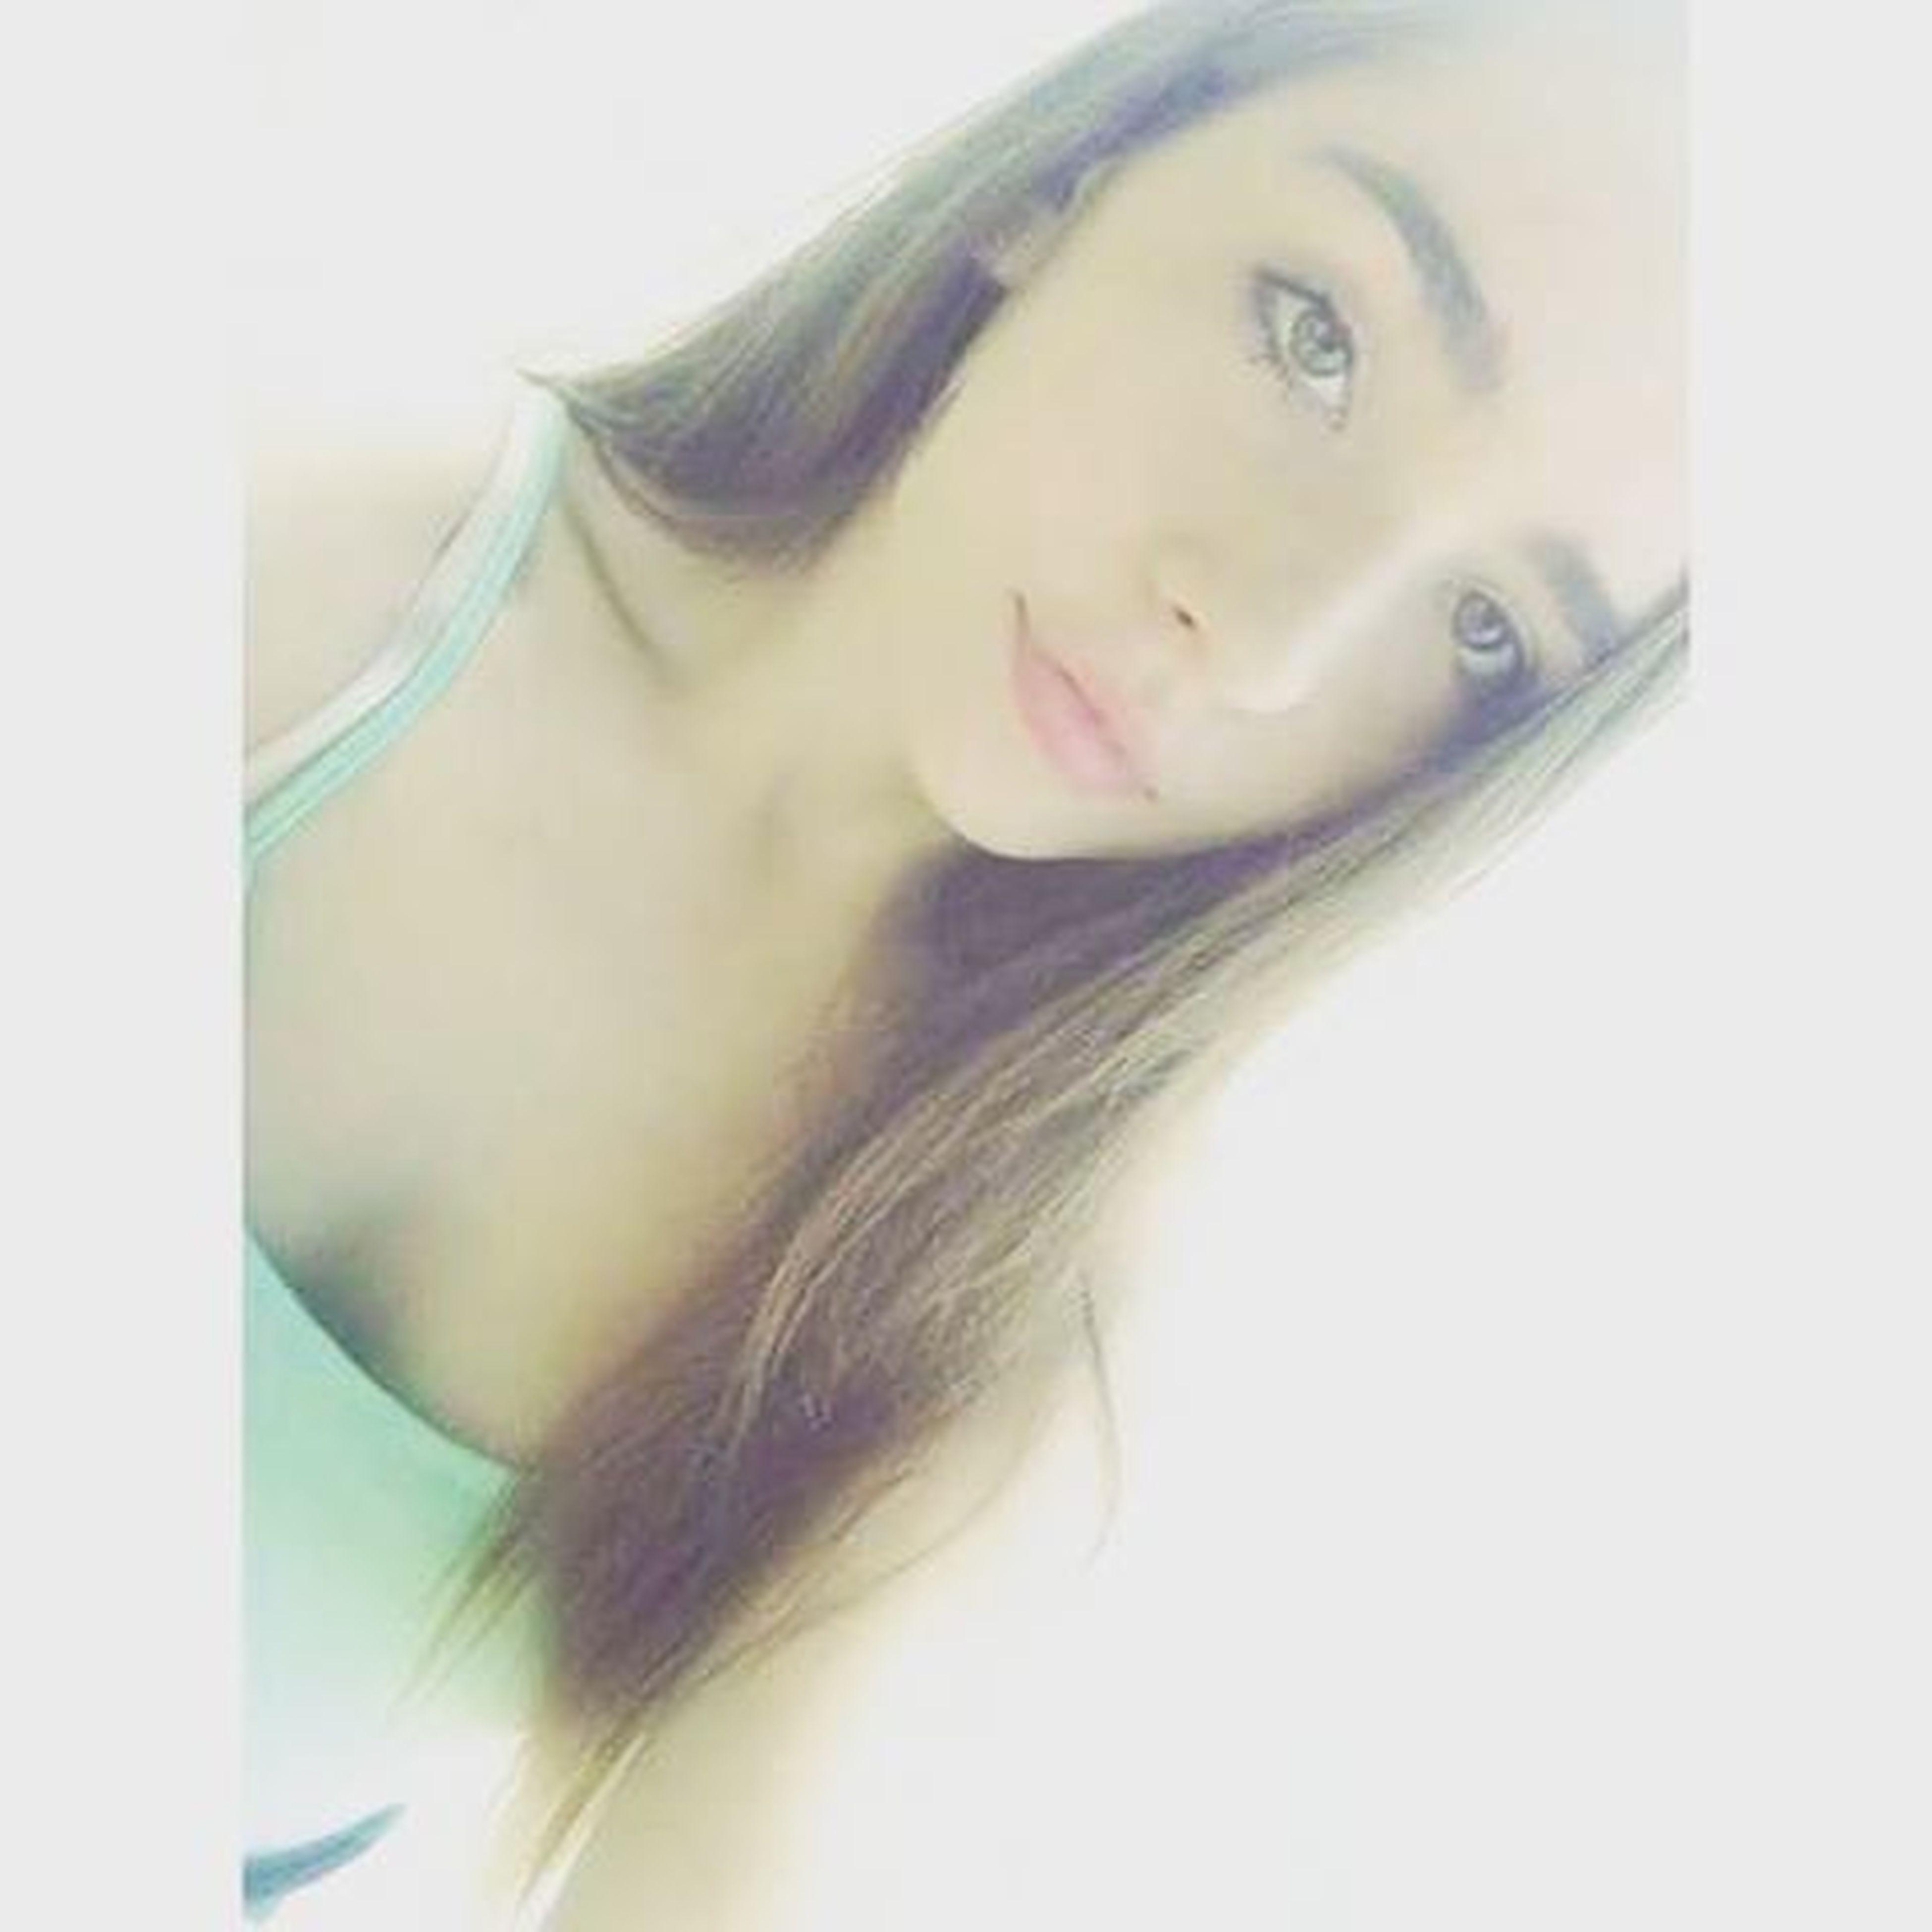 My beautiful daughter Arianagrandelookalike Veryarianagrande Arianagrande Arianatwin